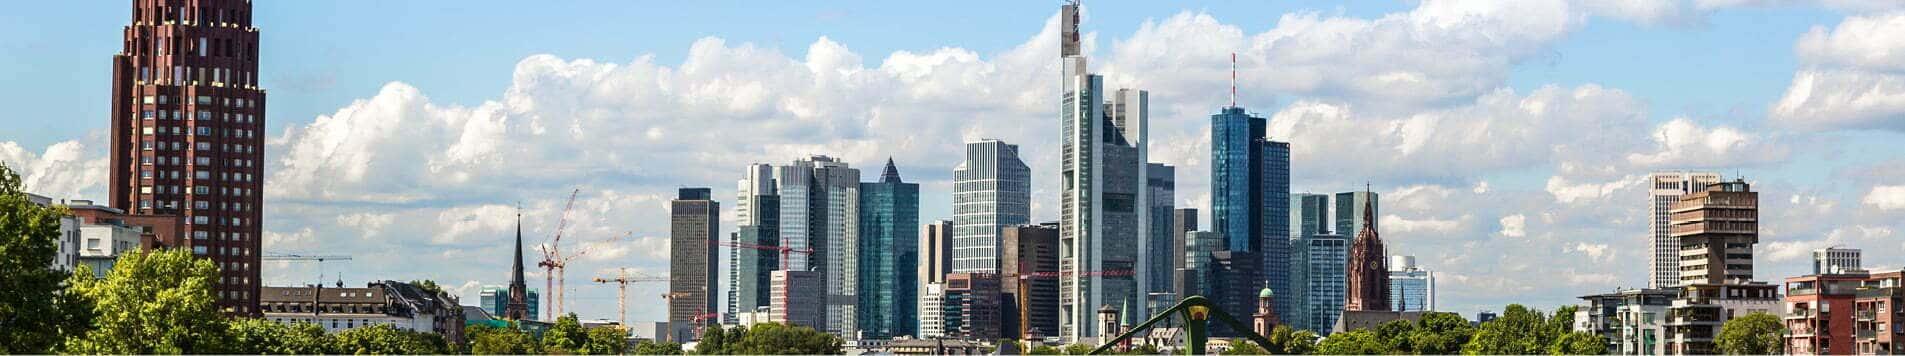 Investoren Meetings Frankfurt am Main